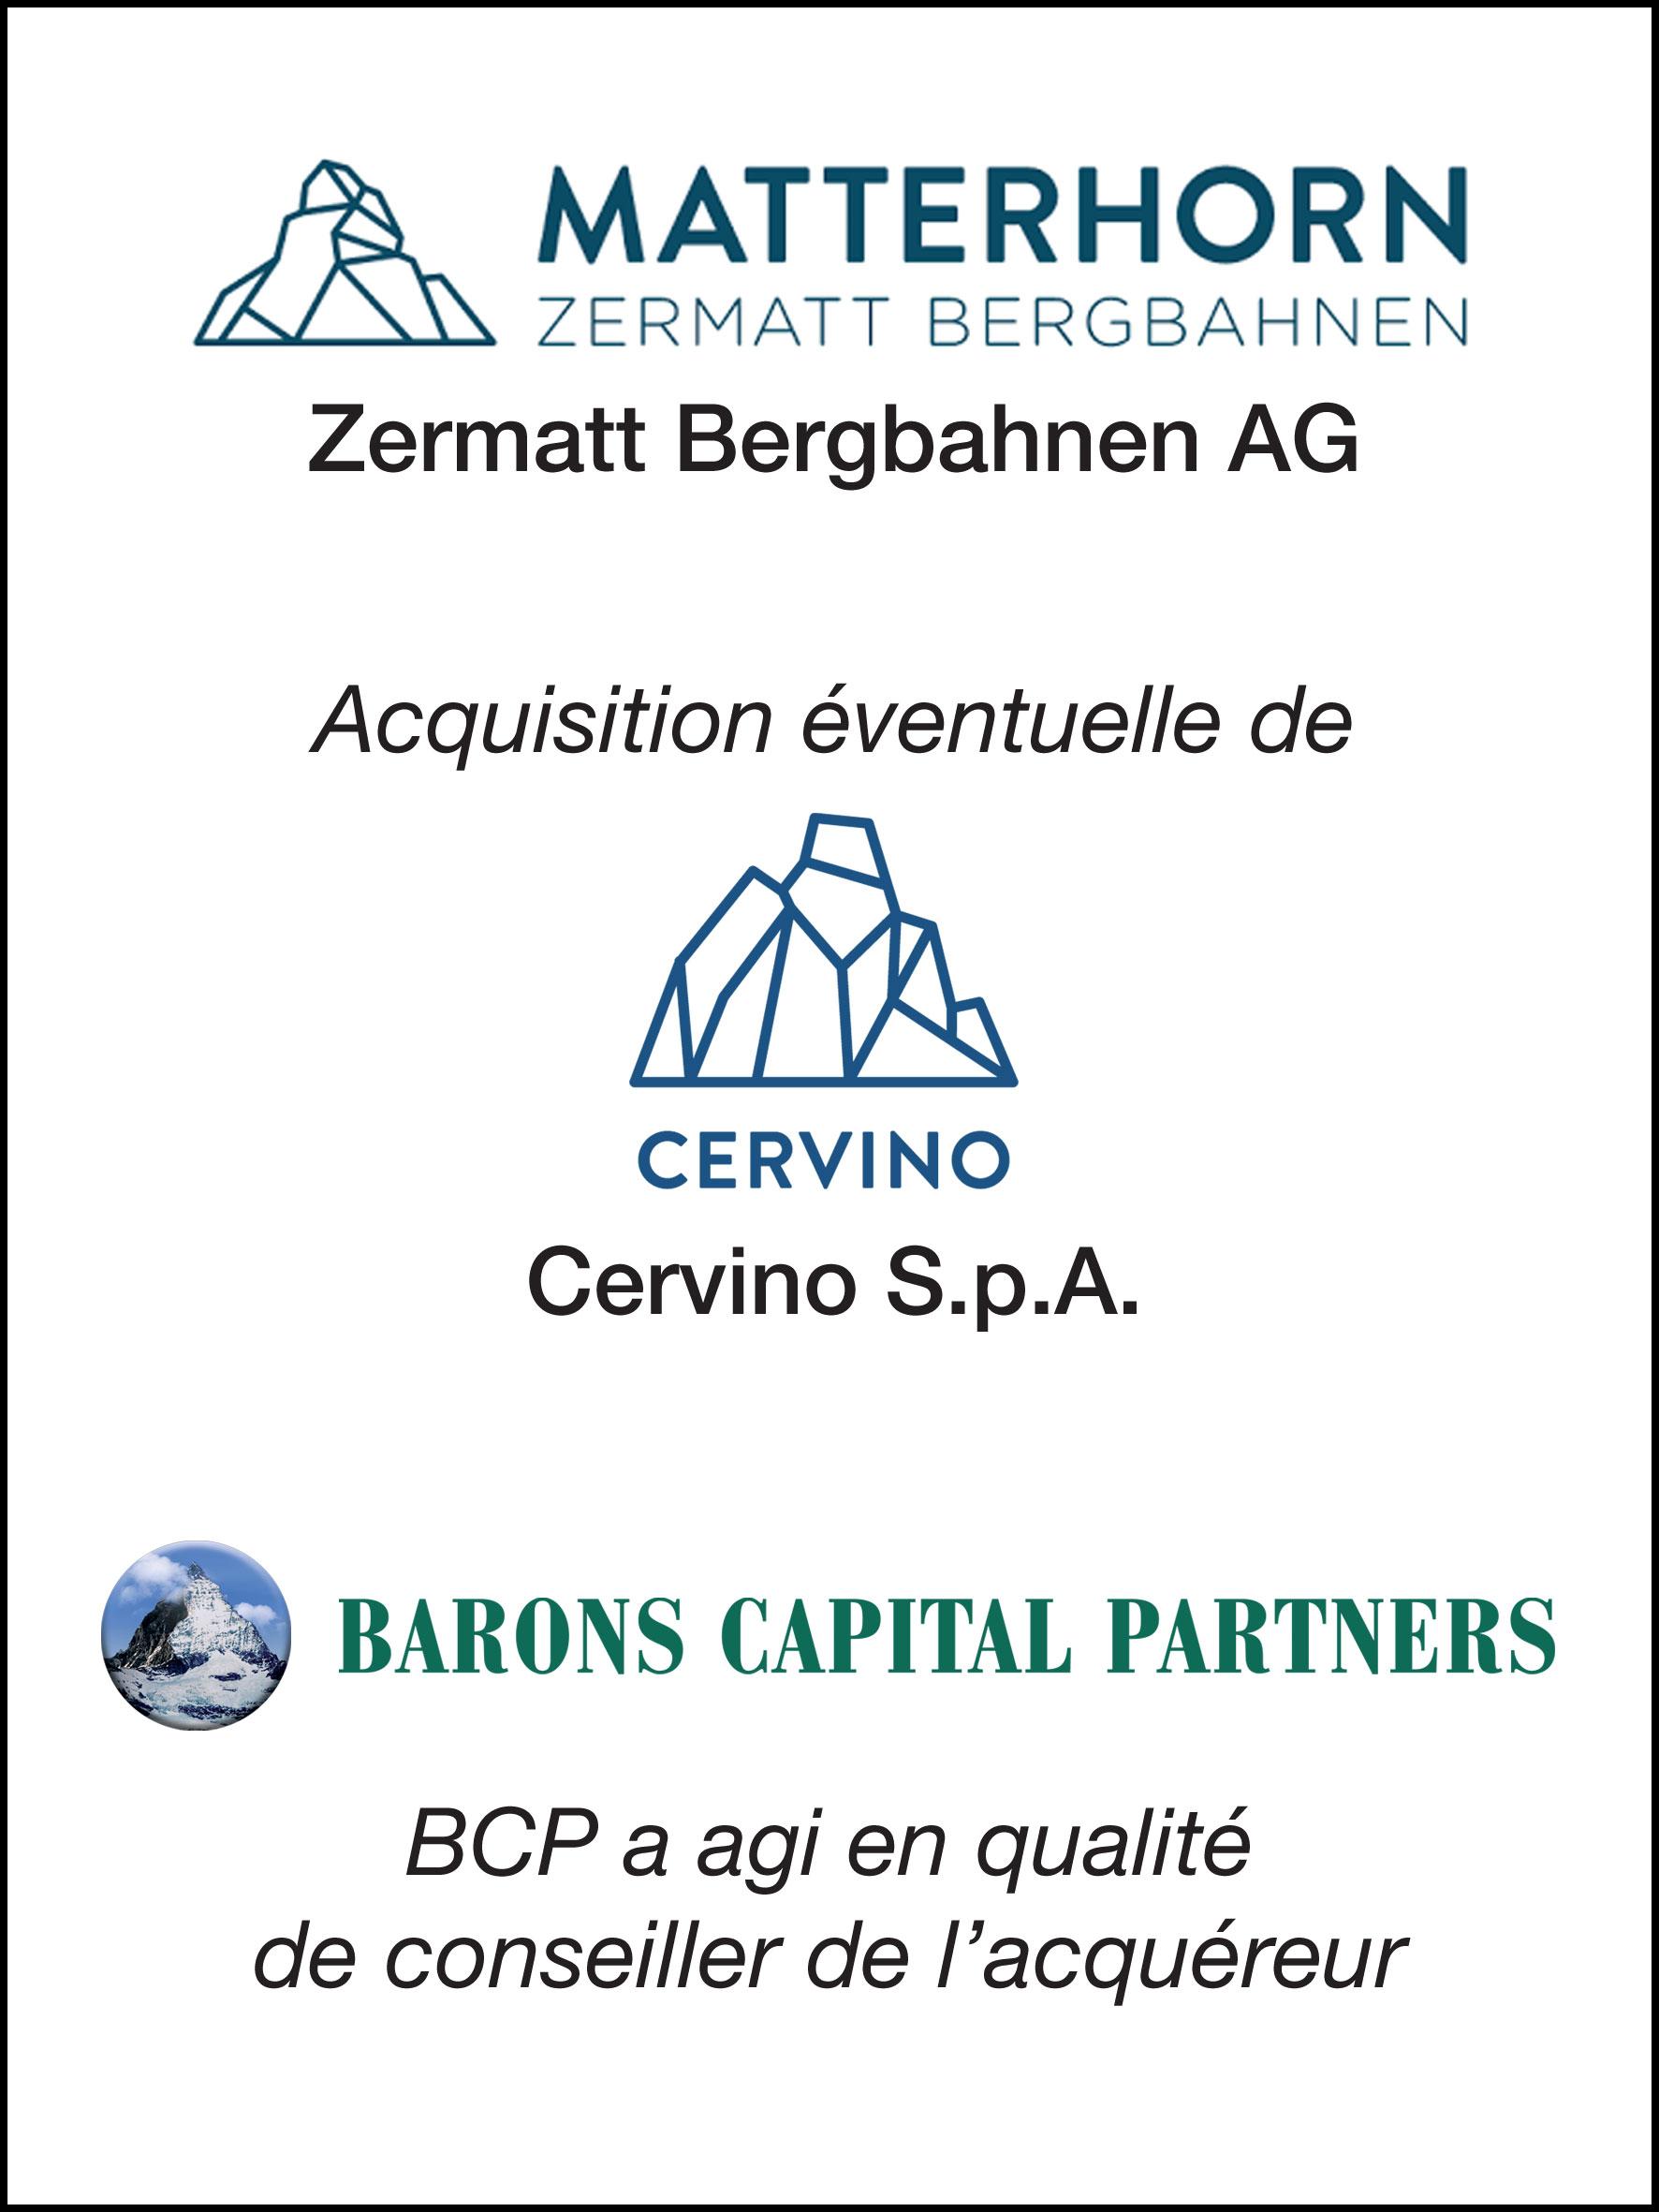 15_Zermatt Bergbahnen AG_F